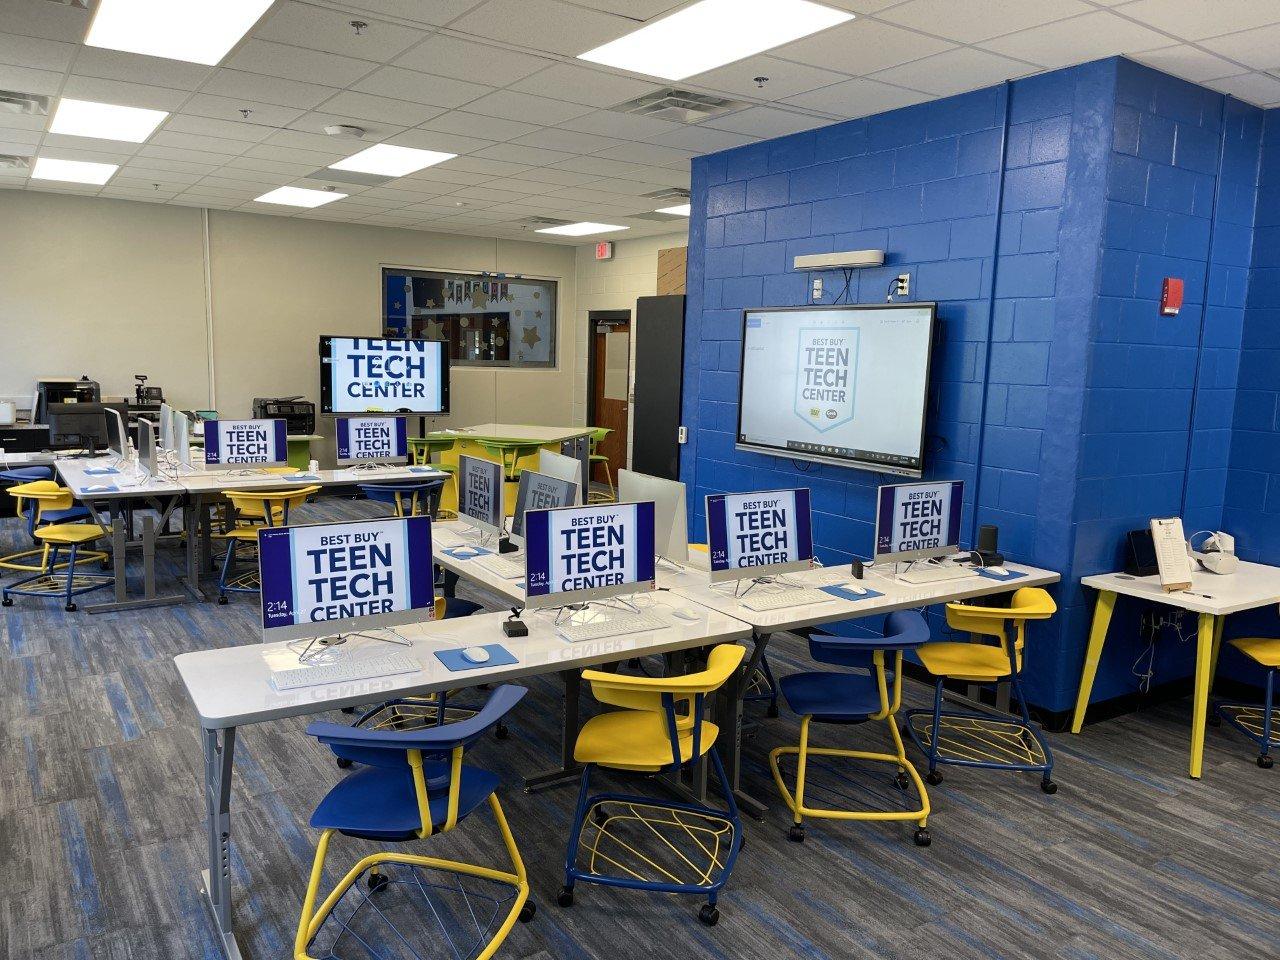 Photo of the Joe R Lee Best Buy Teen Tech Center